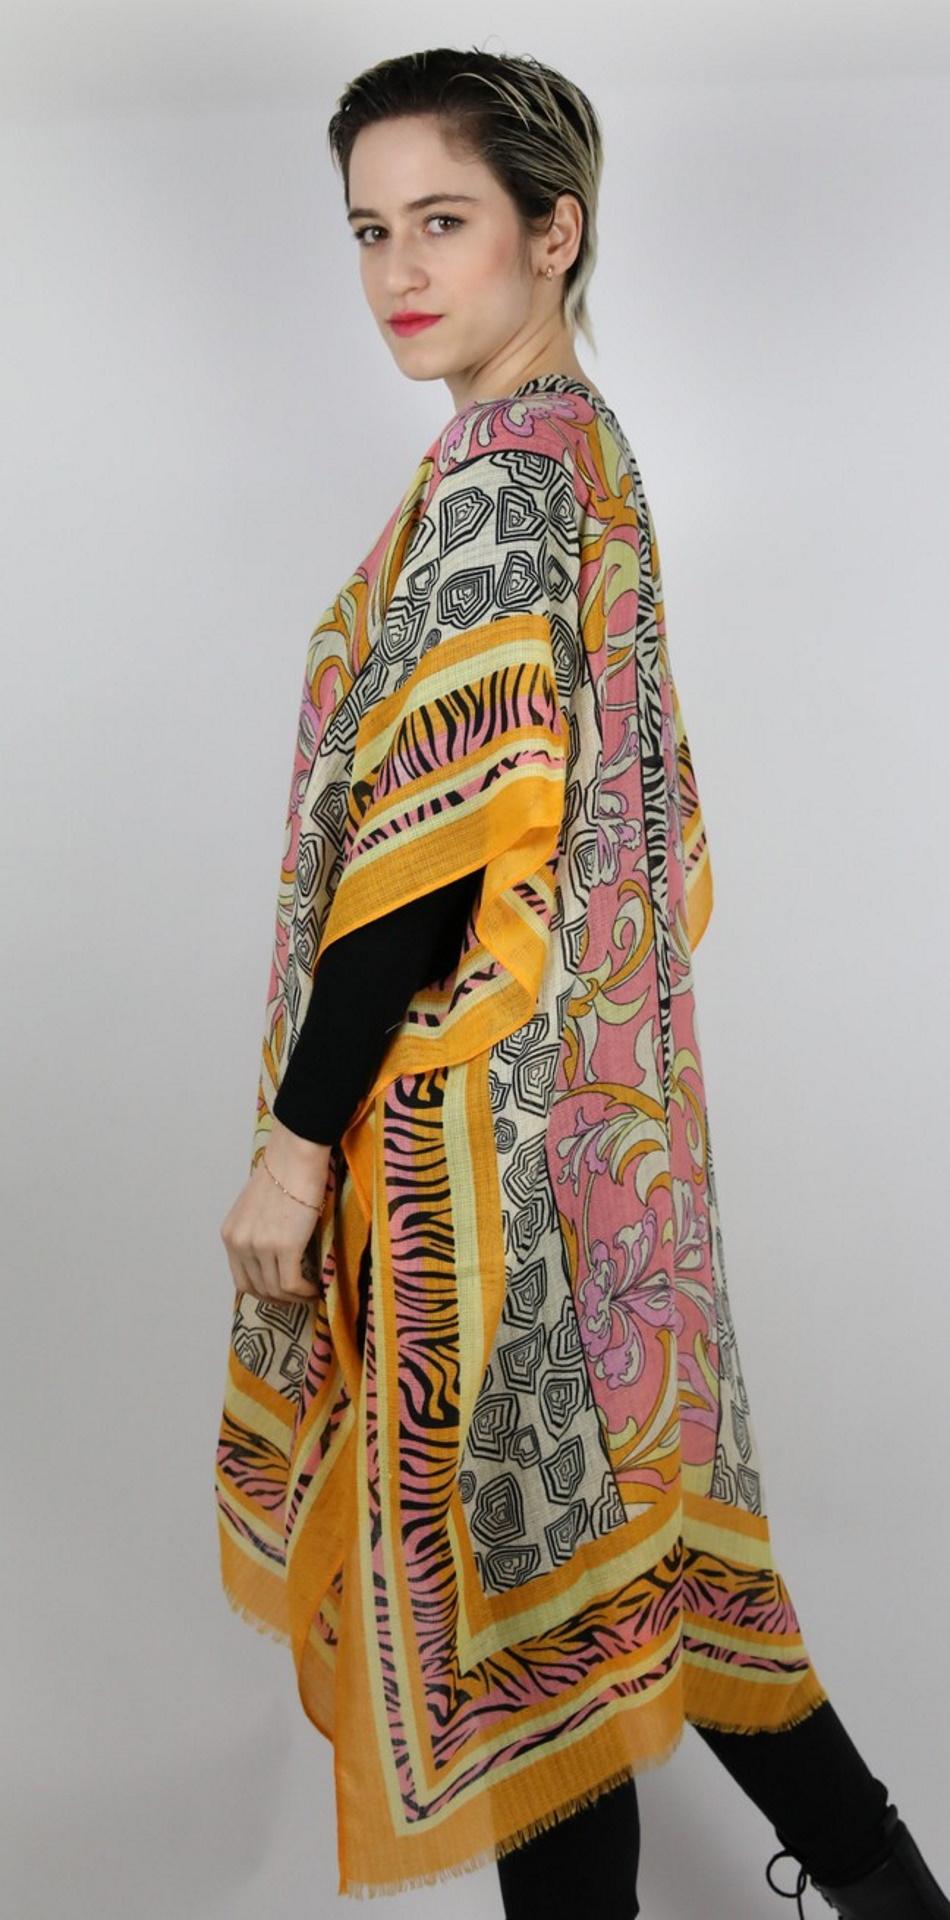 CLOTHES12 STOLA DONNA FOULARD CARDIGAN COPRISPALLE 2 1stAmerican elegante stola da donna foulard cardigan coprispalle